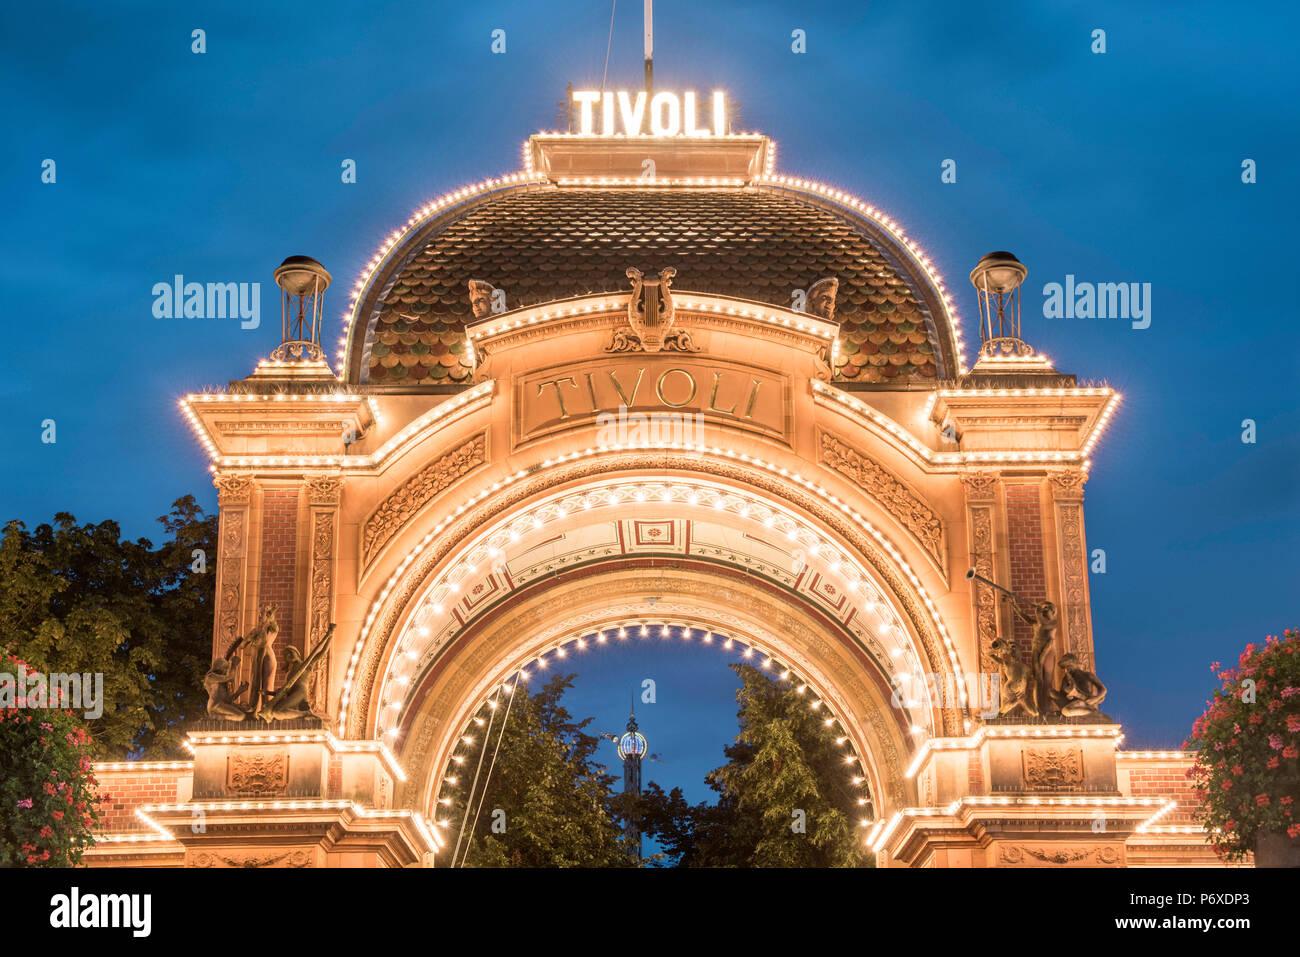 Tivoli gardens, Copenhagen, Hovedstaden, Denmark. The entrance illuminated at dusk. - Stock Image